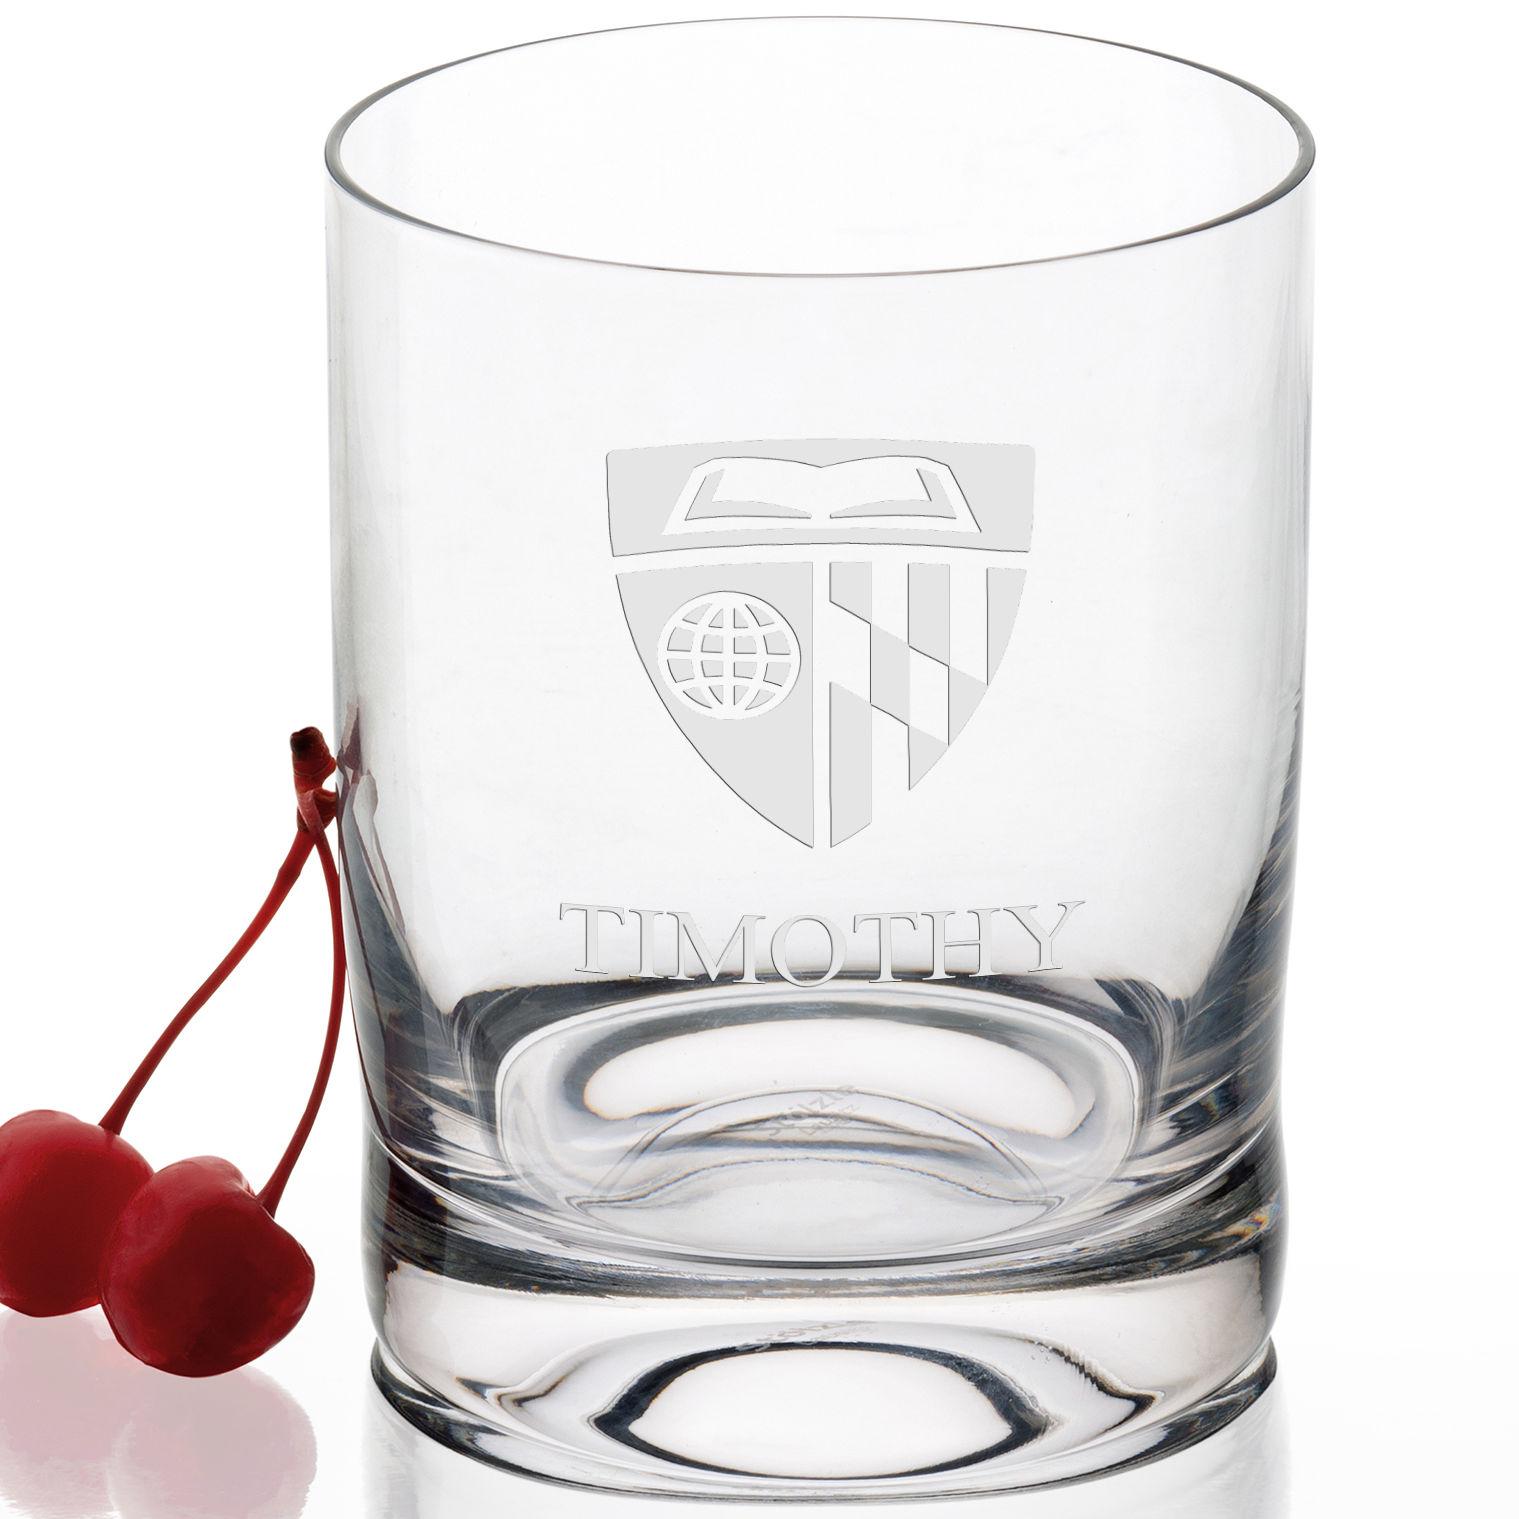 Johns Hopkins University Tumbler Glasses - Set of 2 - Image 2